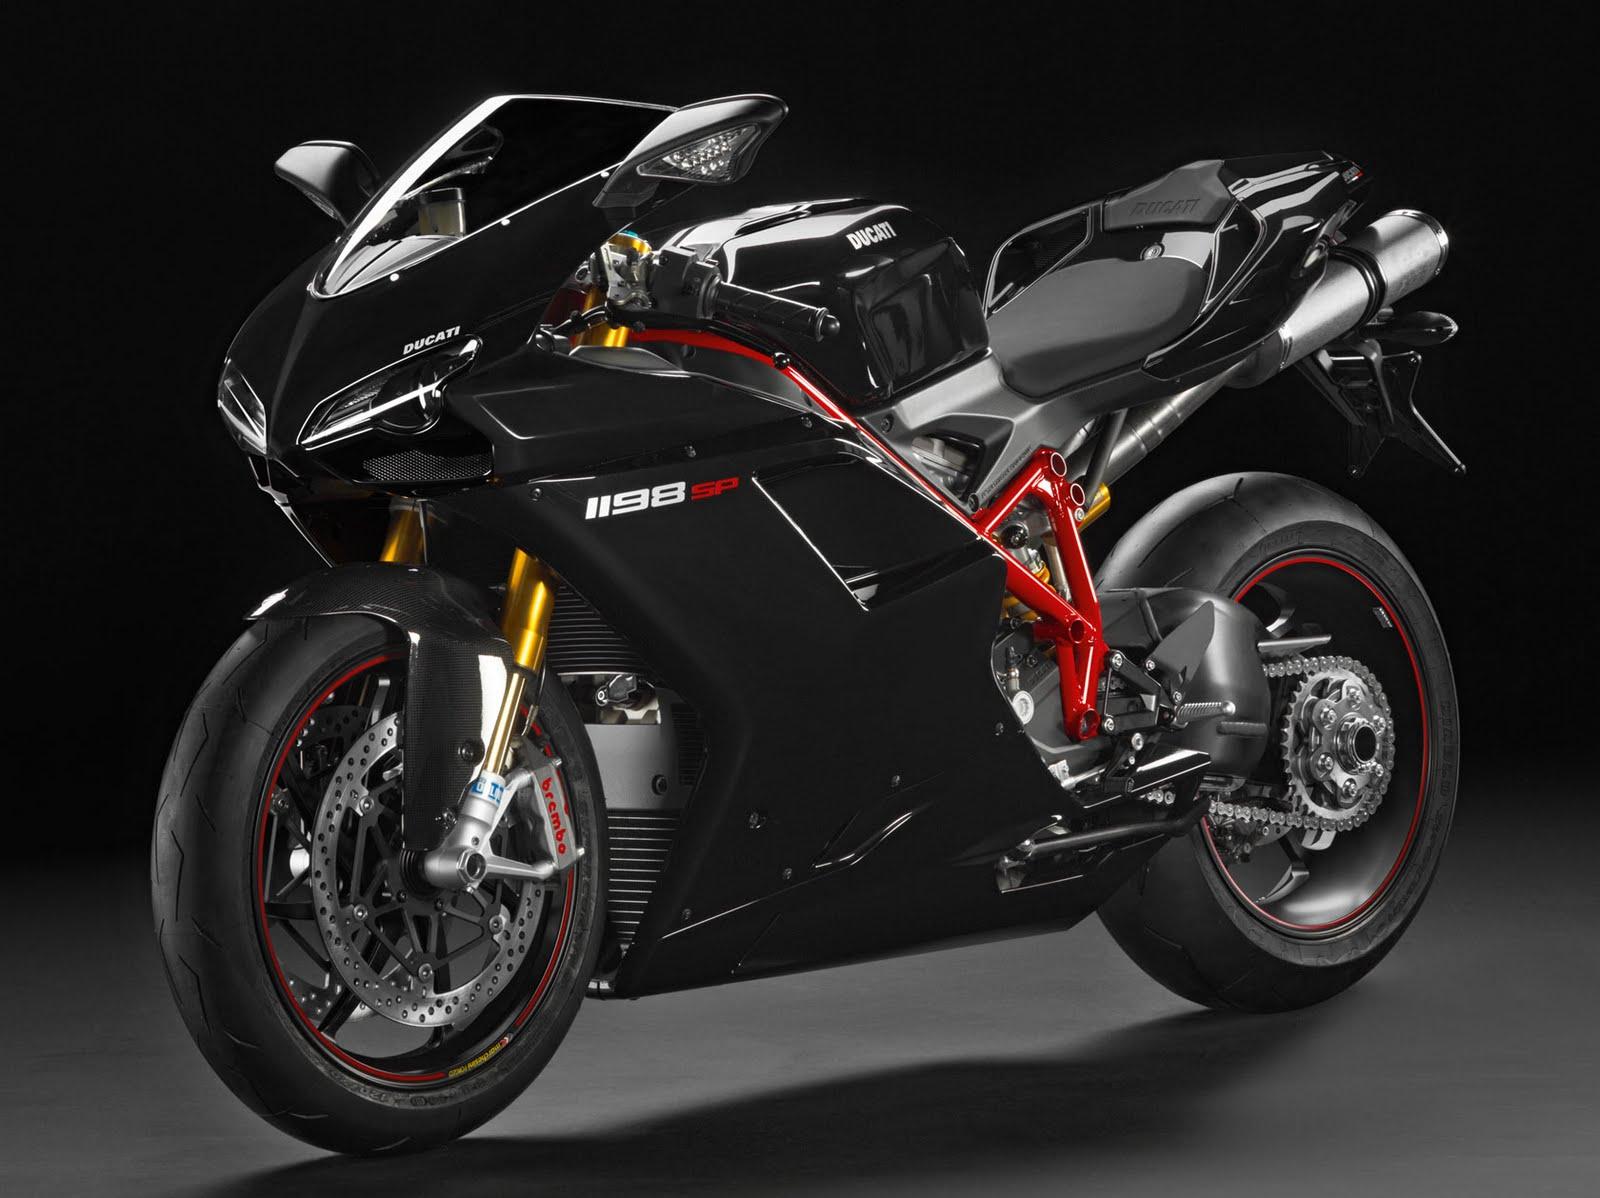 Top Motorcycle Wallpapers: 2011 Ducati 1198SP Superbike